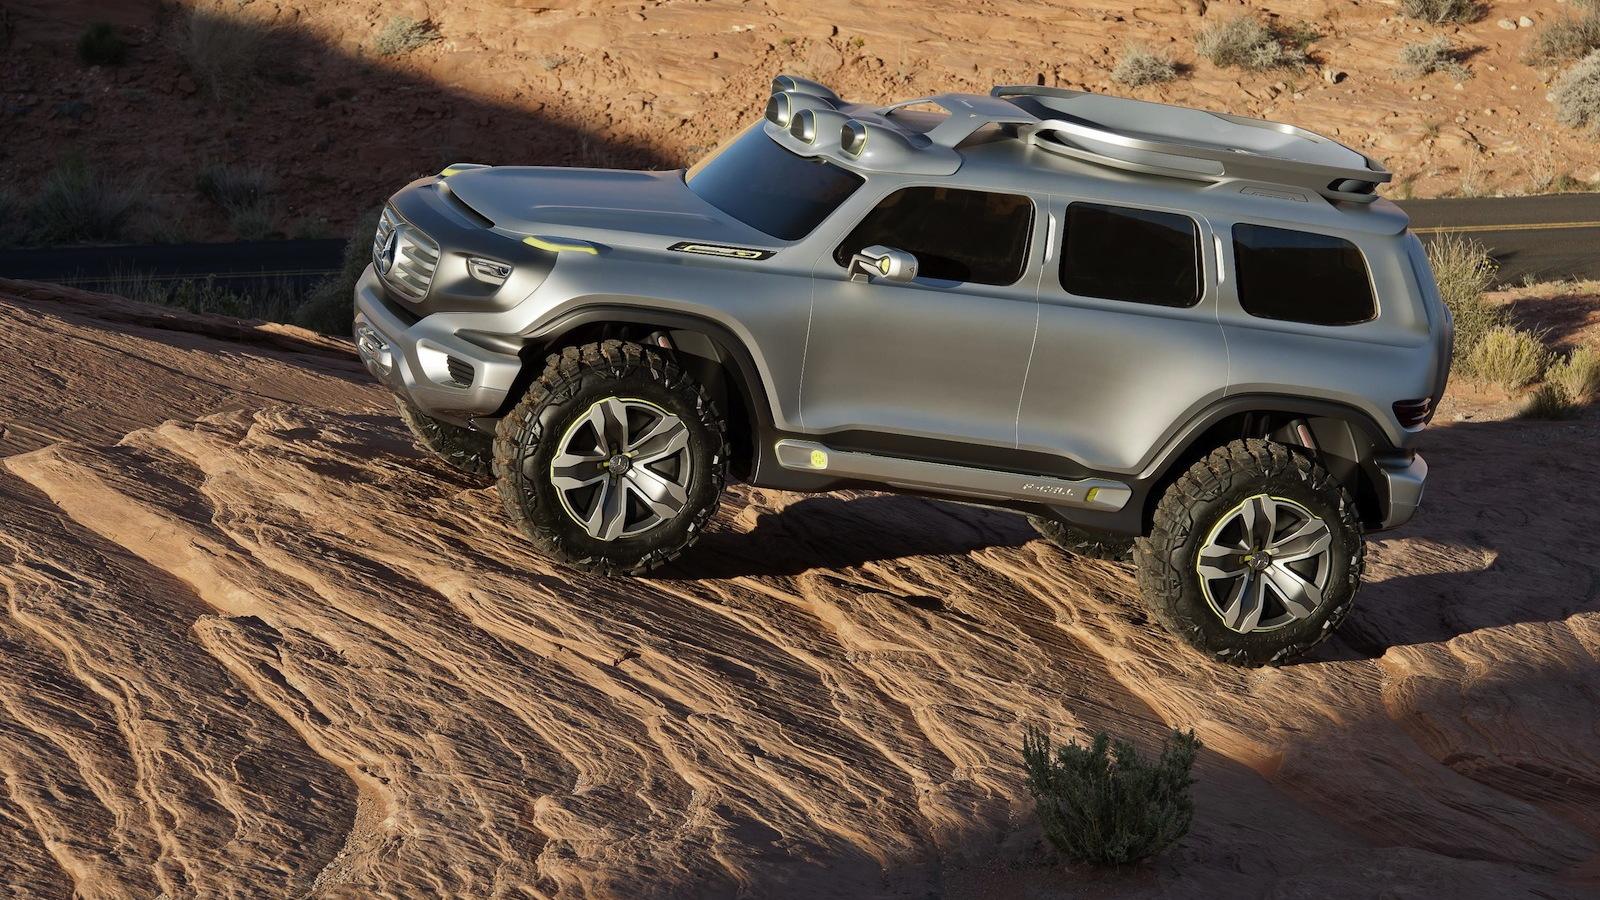 Mercedes-Benz Ener-G-Force off-road concept